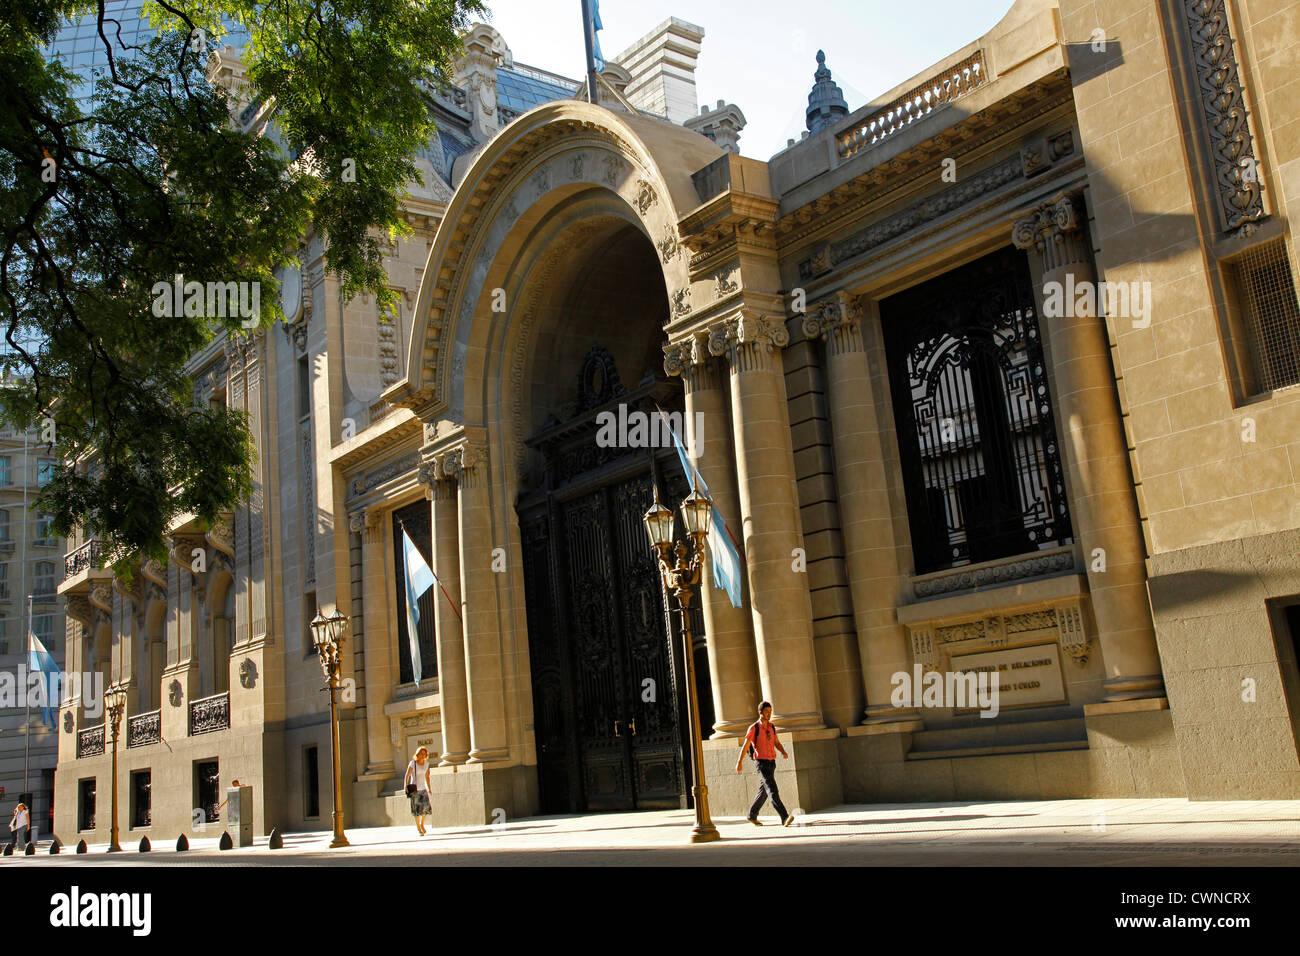 Palacio San Martin at Plaza San Martin, Retiro, Buenos Aires, Argentina. - Stock Image